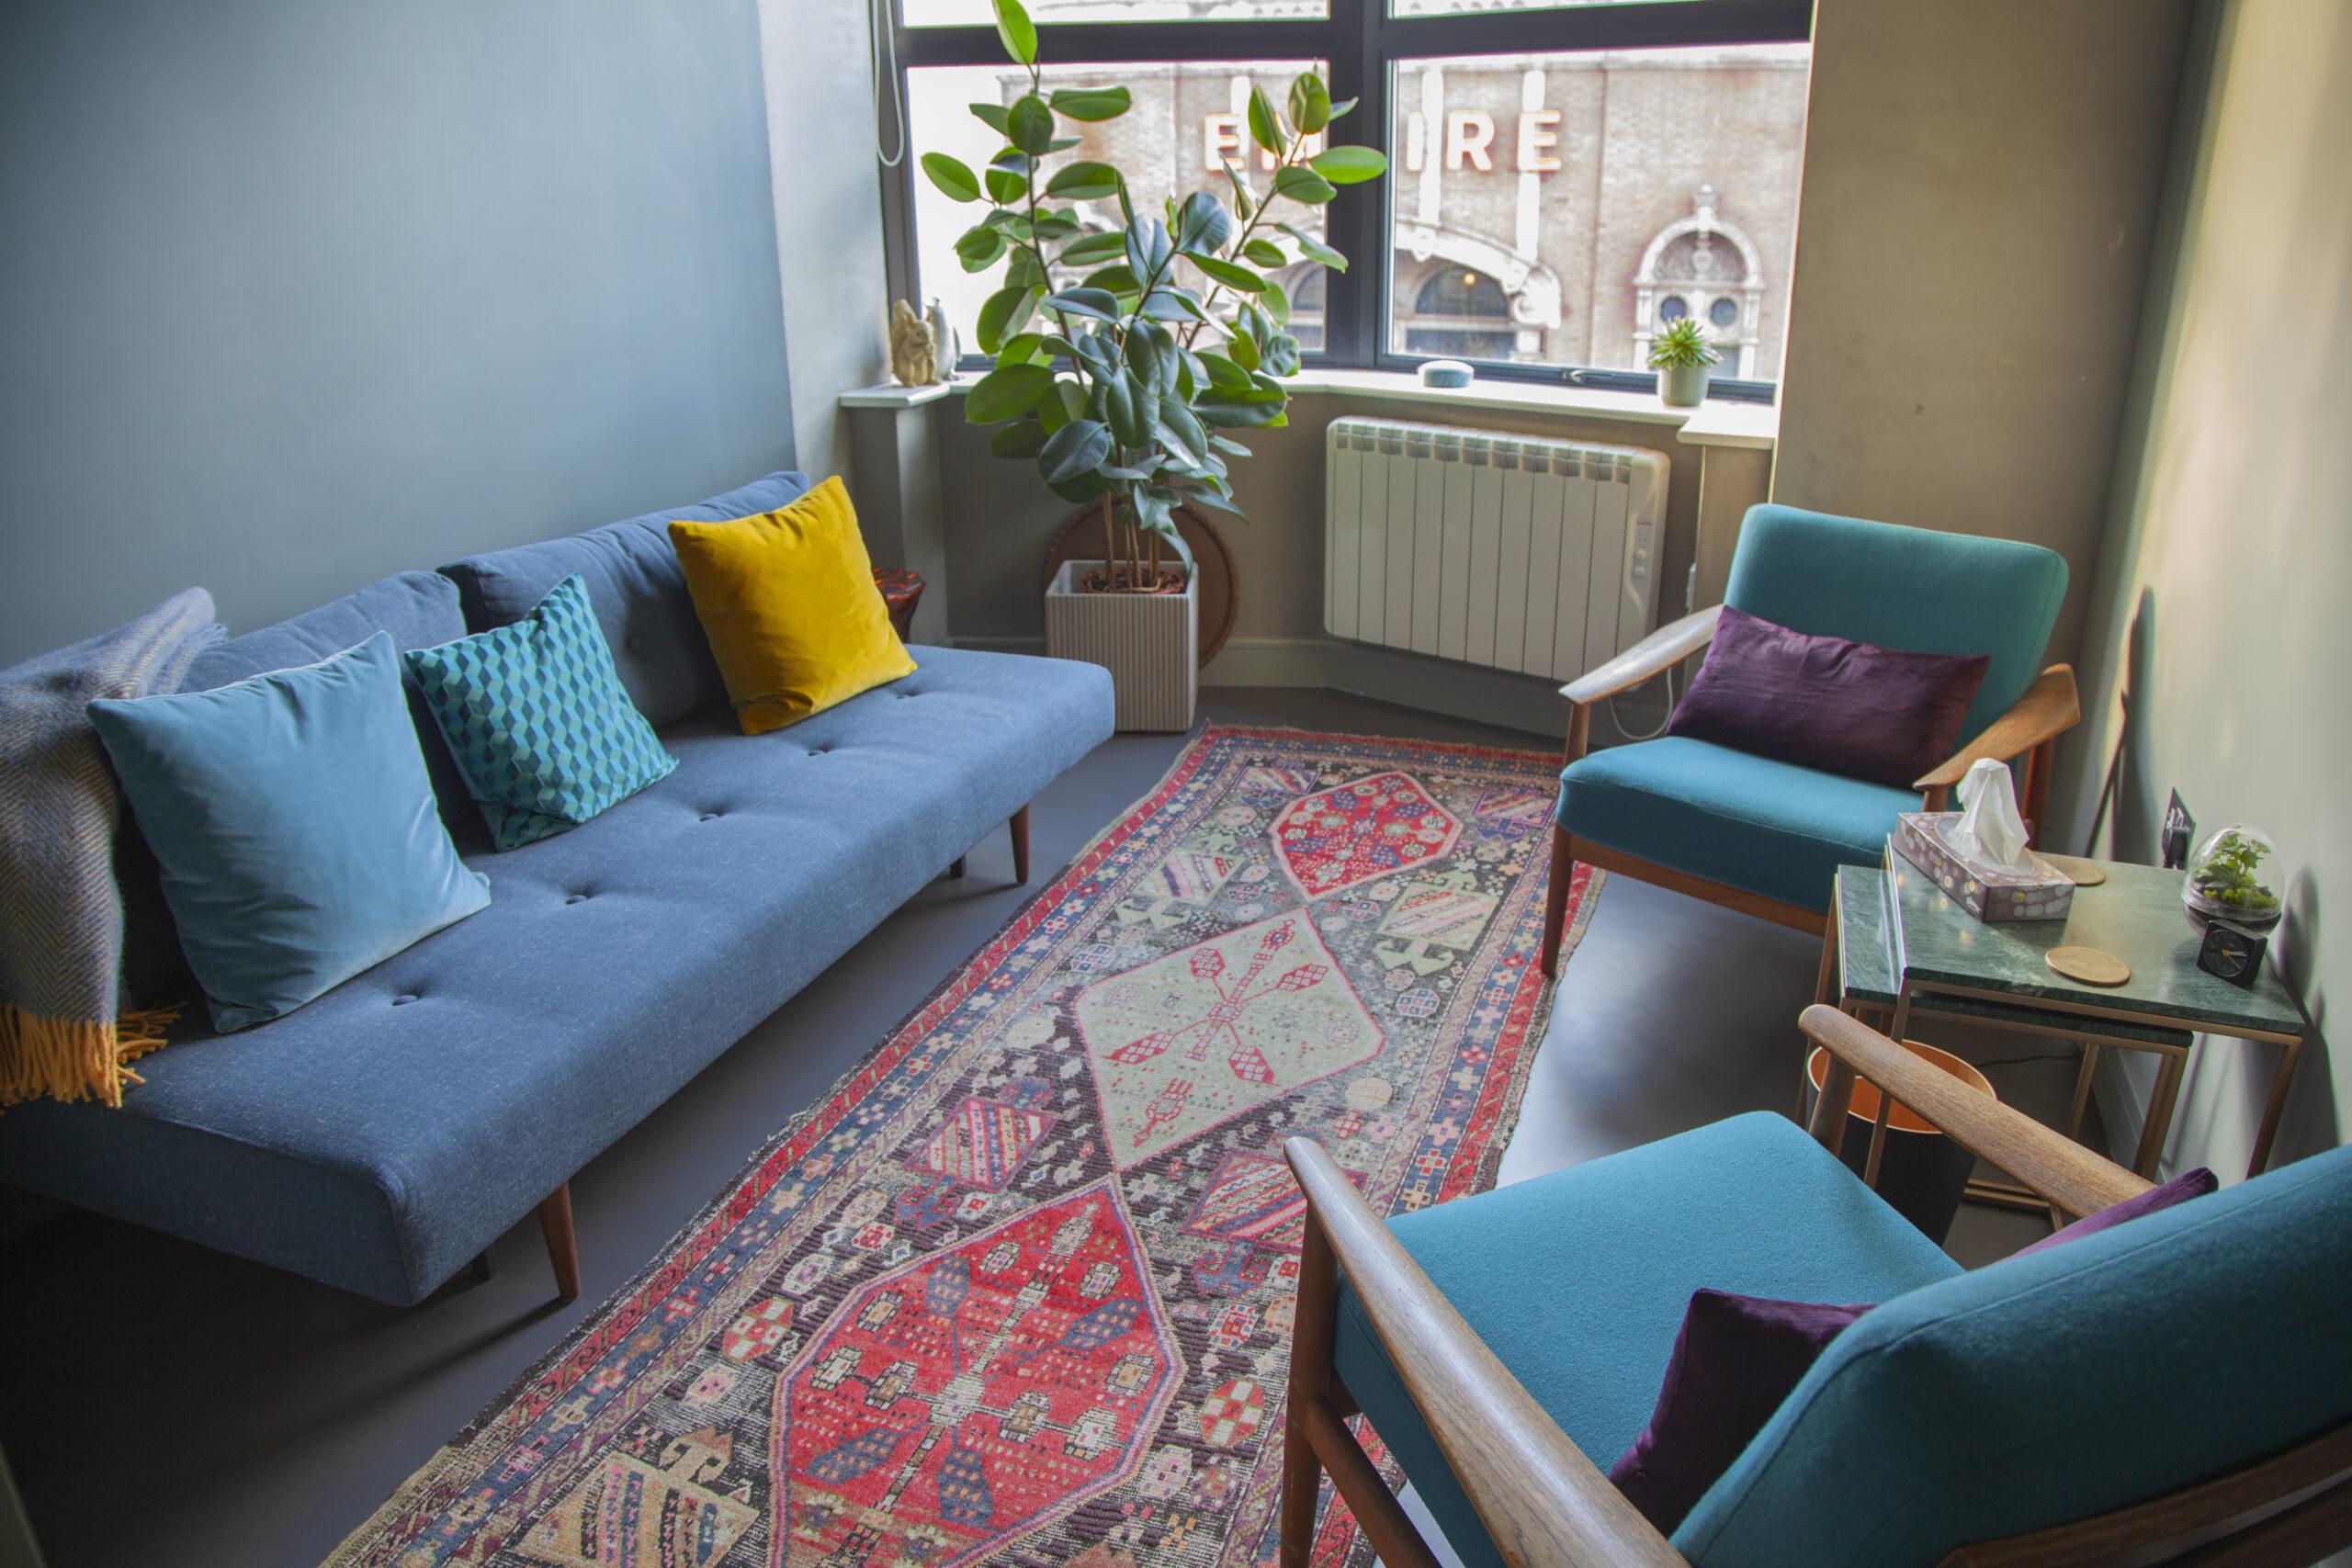 Hackney Consulting Rooms to Rent - Querencia Room Hackney Empire